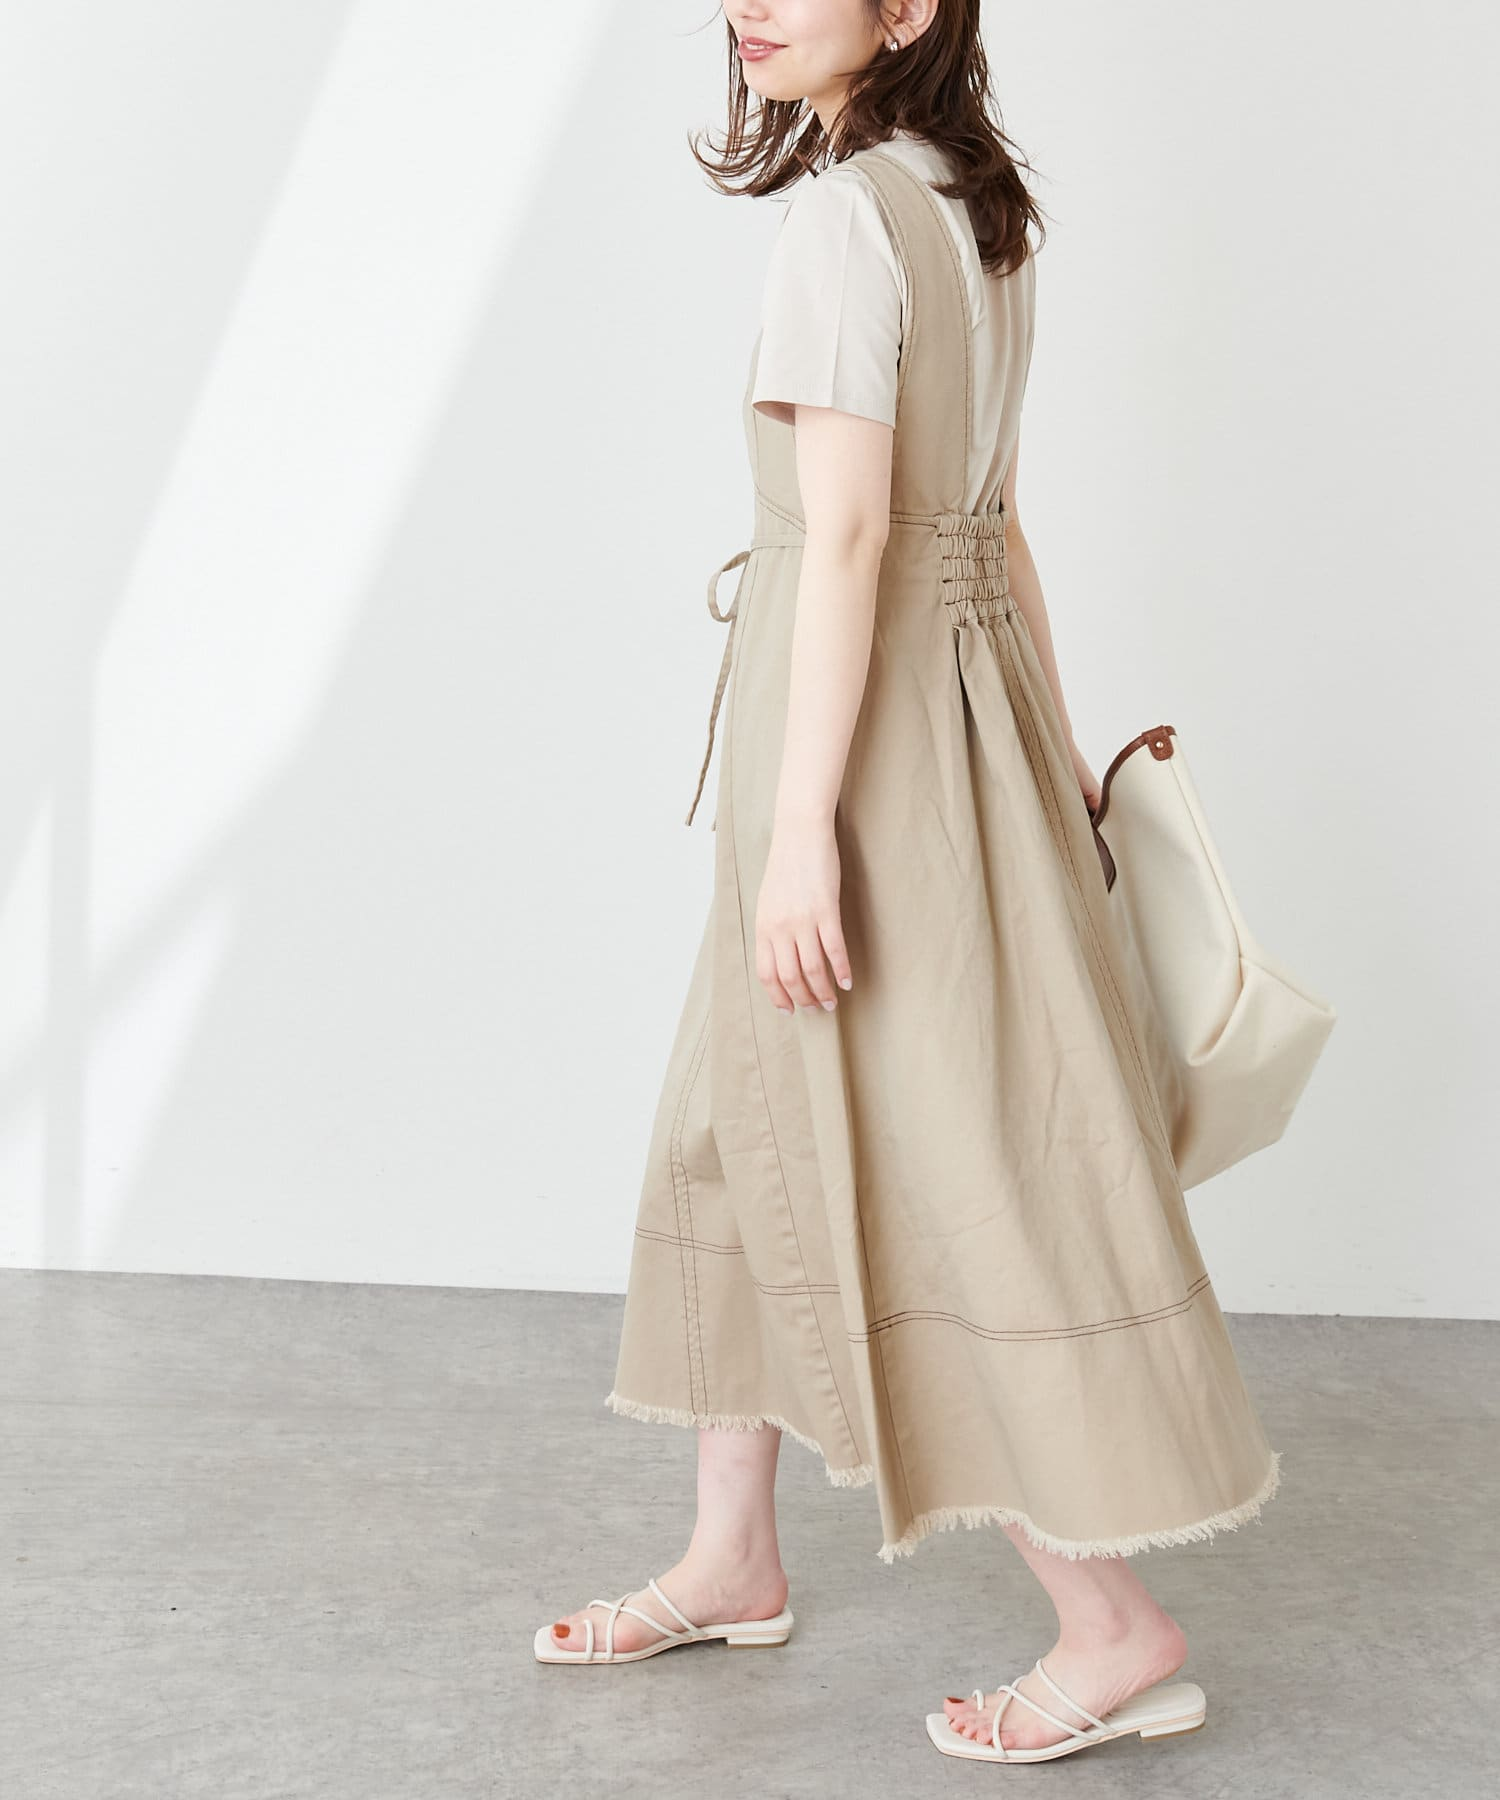 natural couture(ナチュラルクチュール) 裾フリンジ配色ステッチジャンスカ